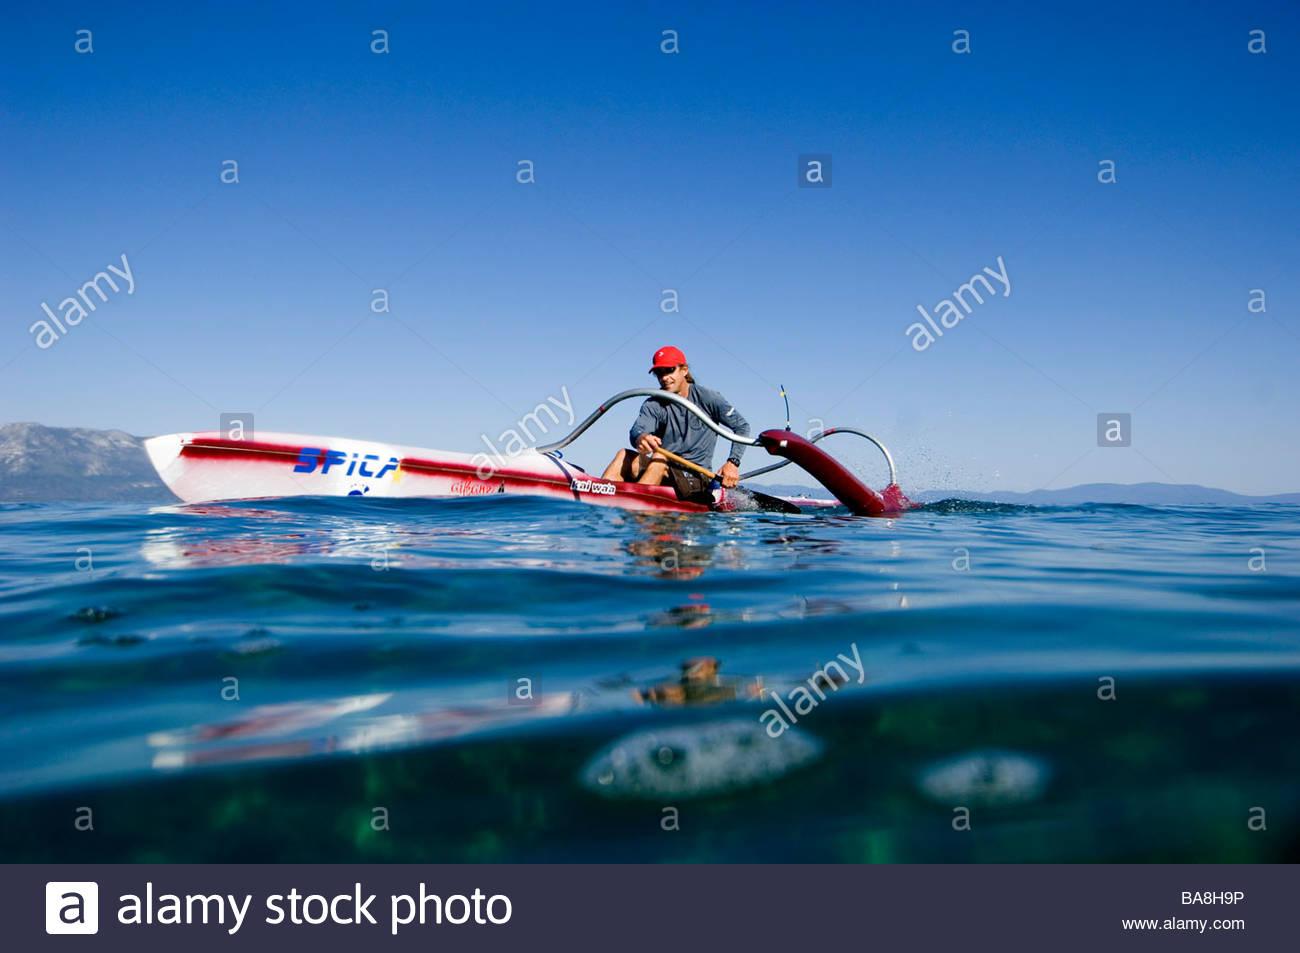 Outrigger Paddling on Lake Tahoe, California - Stock Image